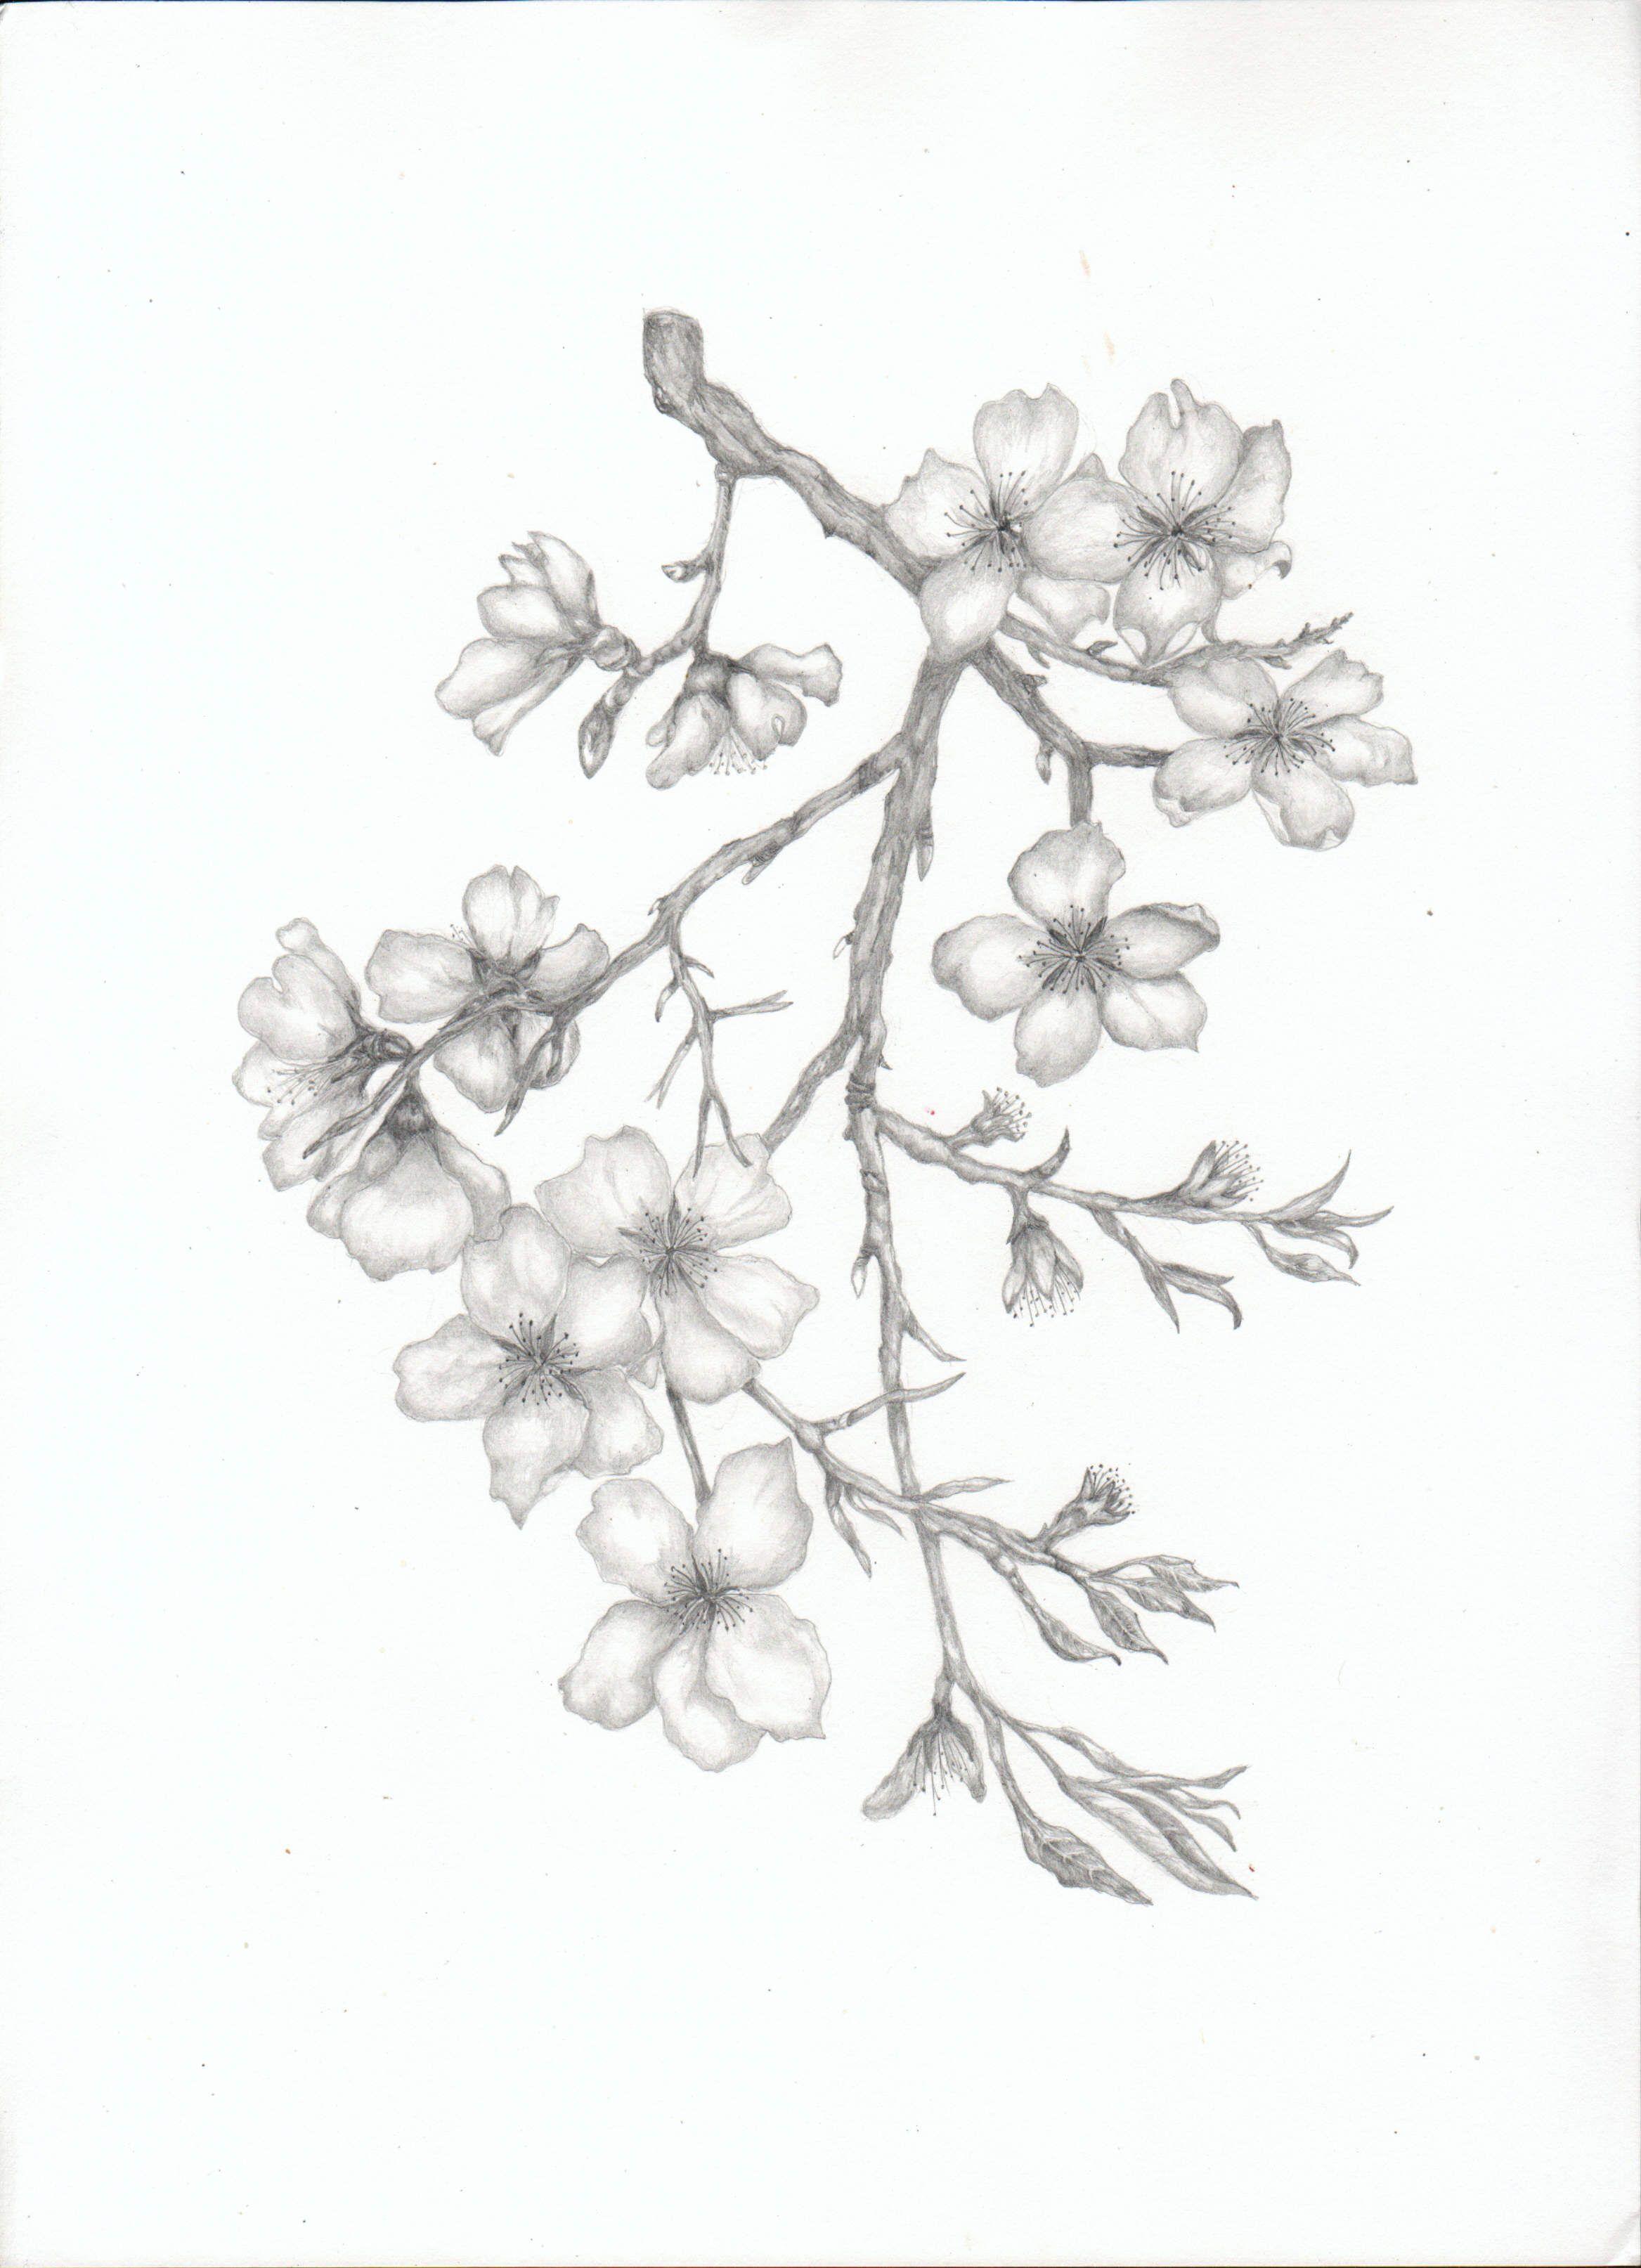 almond blossom branch tats pinterest almonds tattoo and tatting. Black Bedroom Furniture Sets. Home Design Ideas